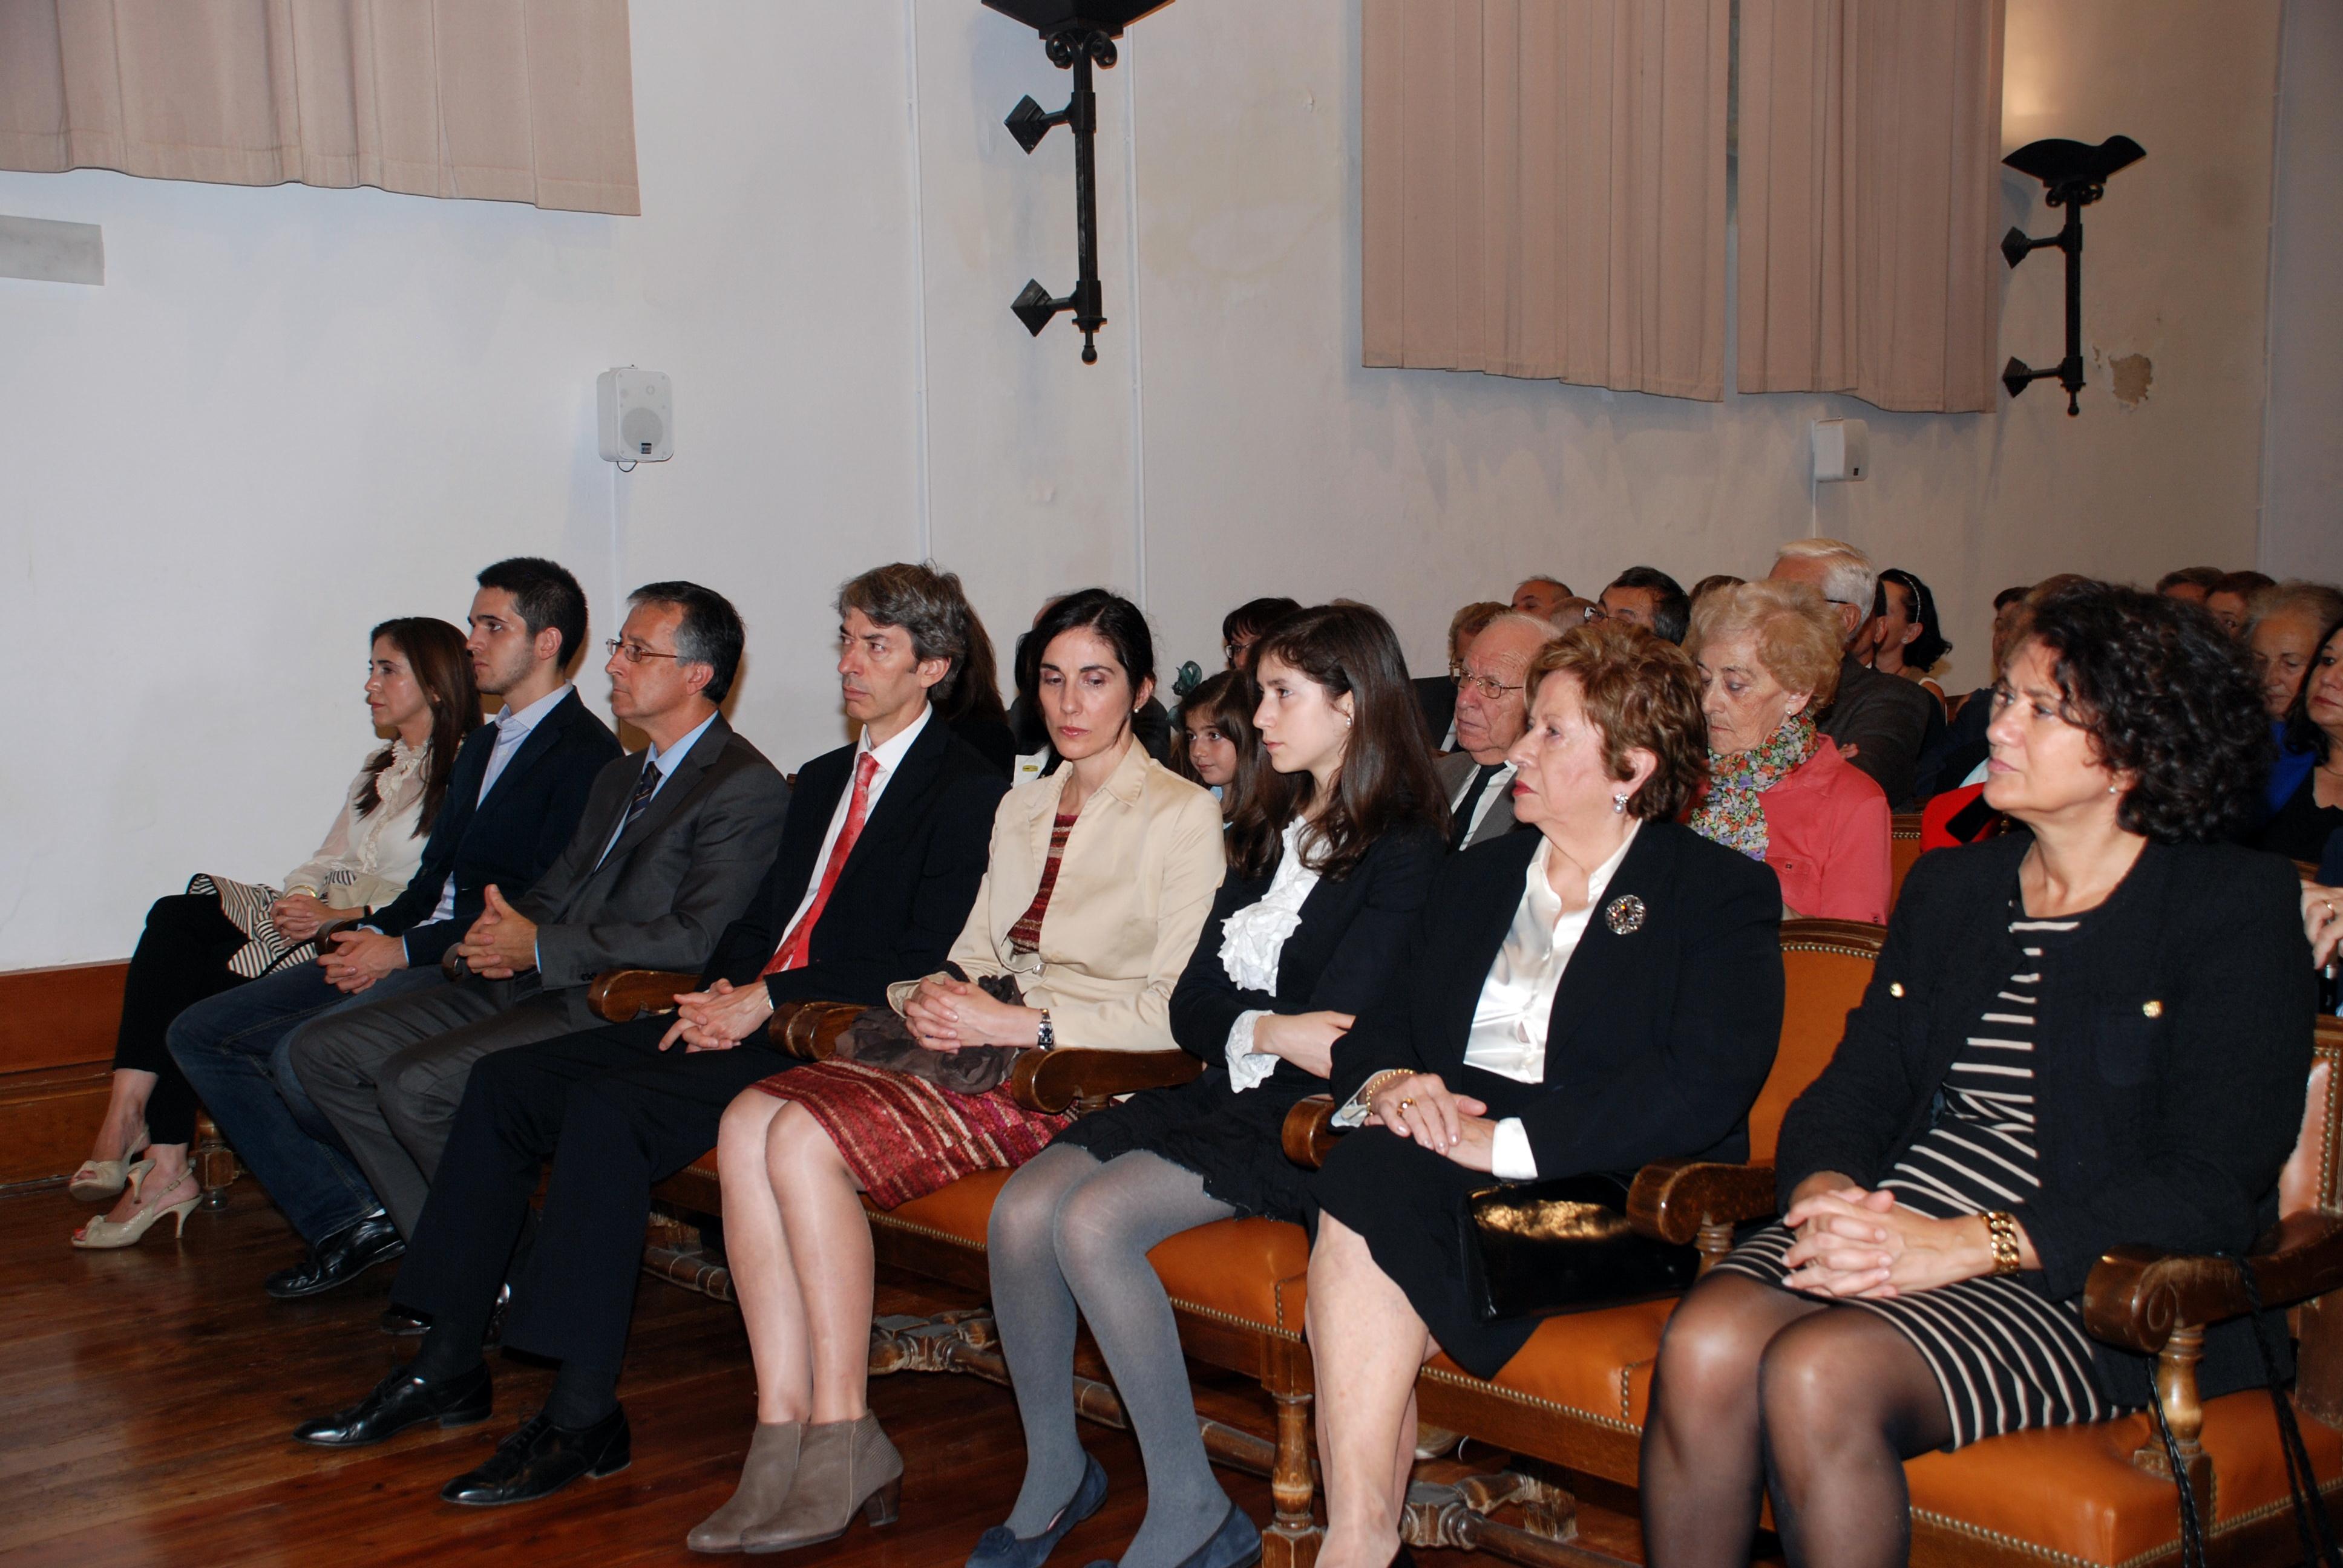 La Universidad de Salamanca rinde homenaje al exrector Pedro Amat